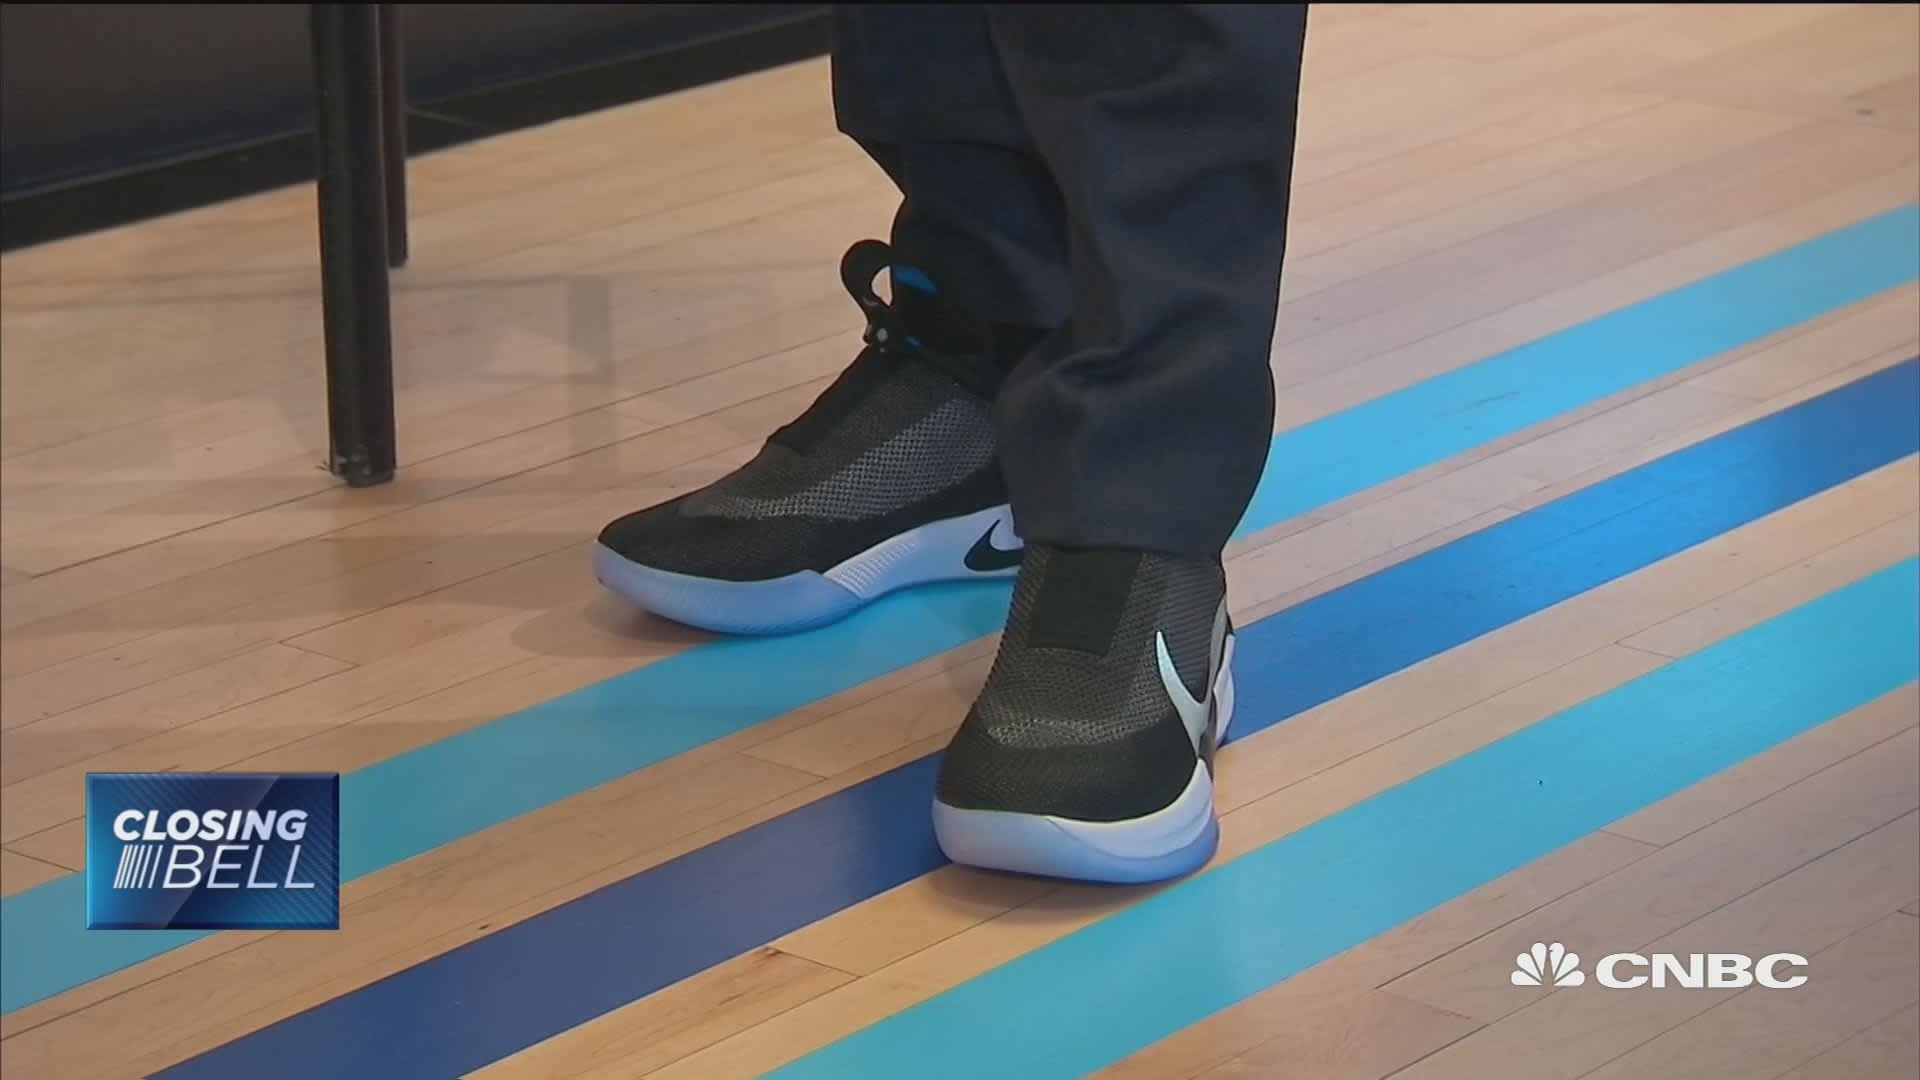 c27ff8e0c30ac You can lace Nike s Adapt BB shoes with a smartphone app